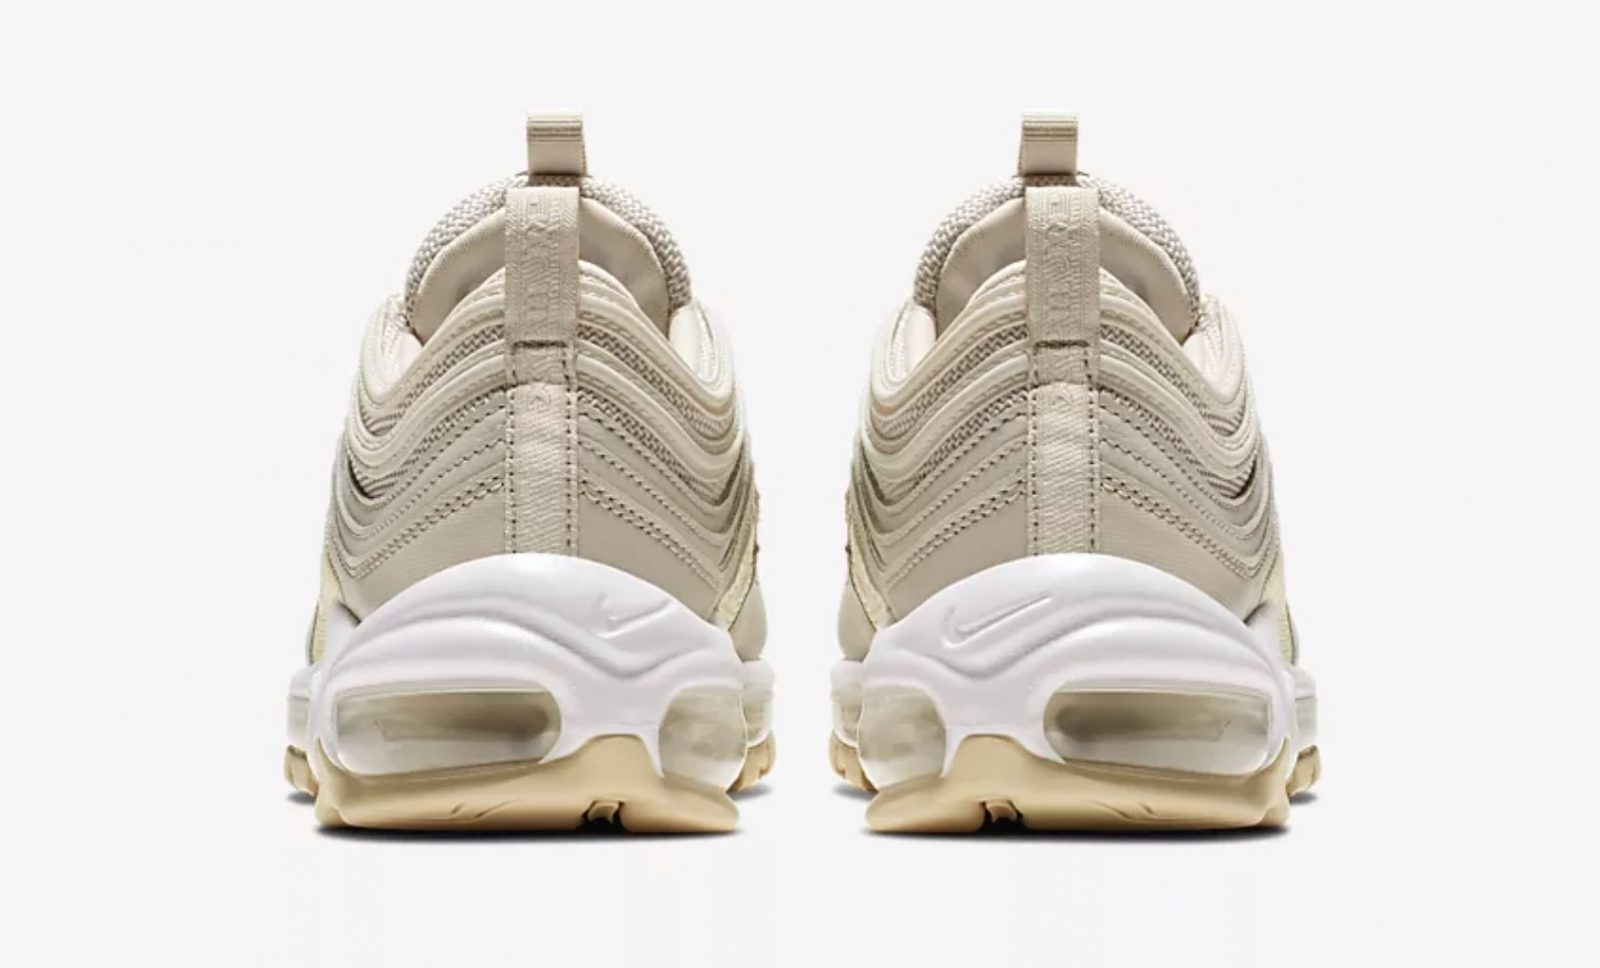 Nike's Air Max 97 Desert Sand | 921733-013